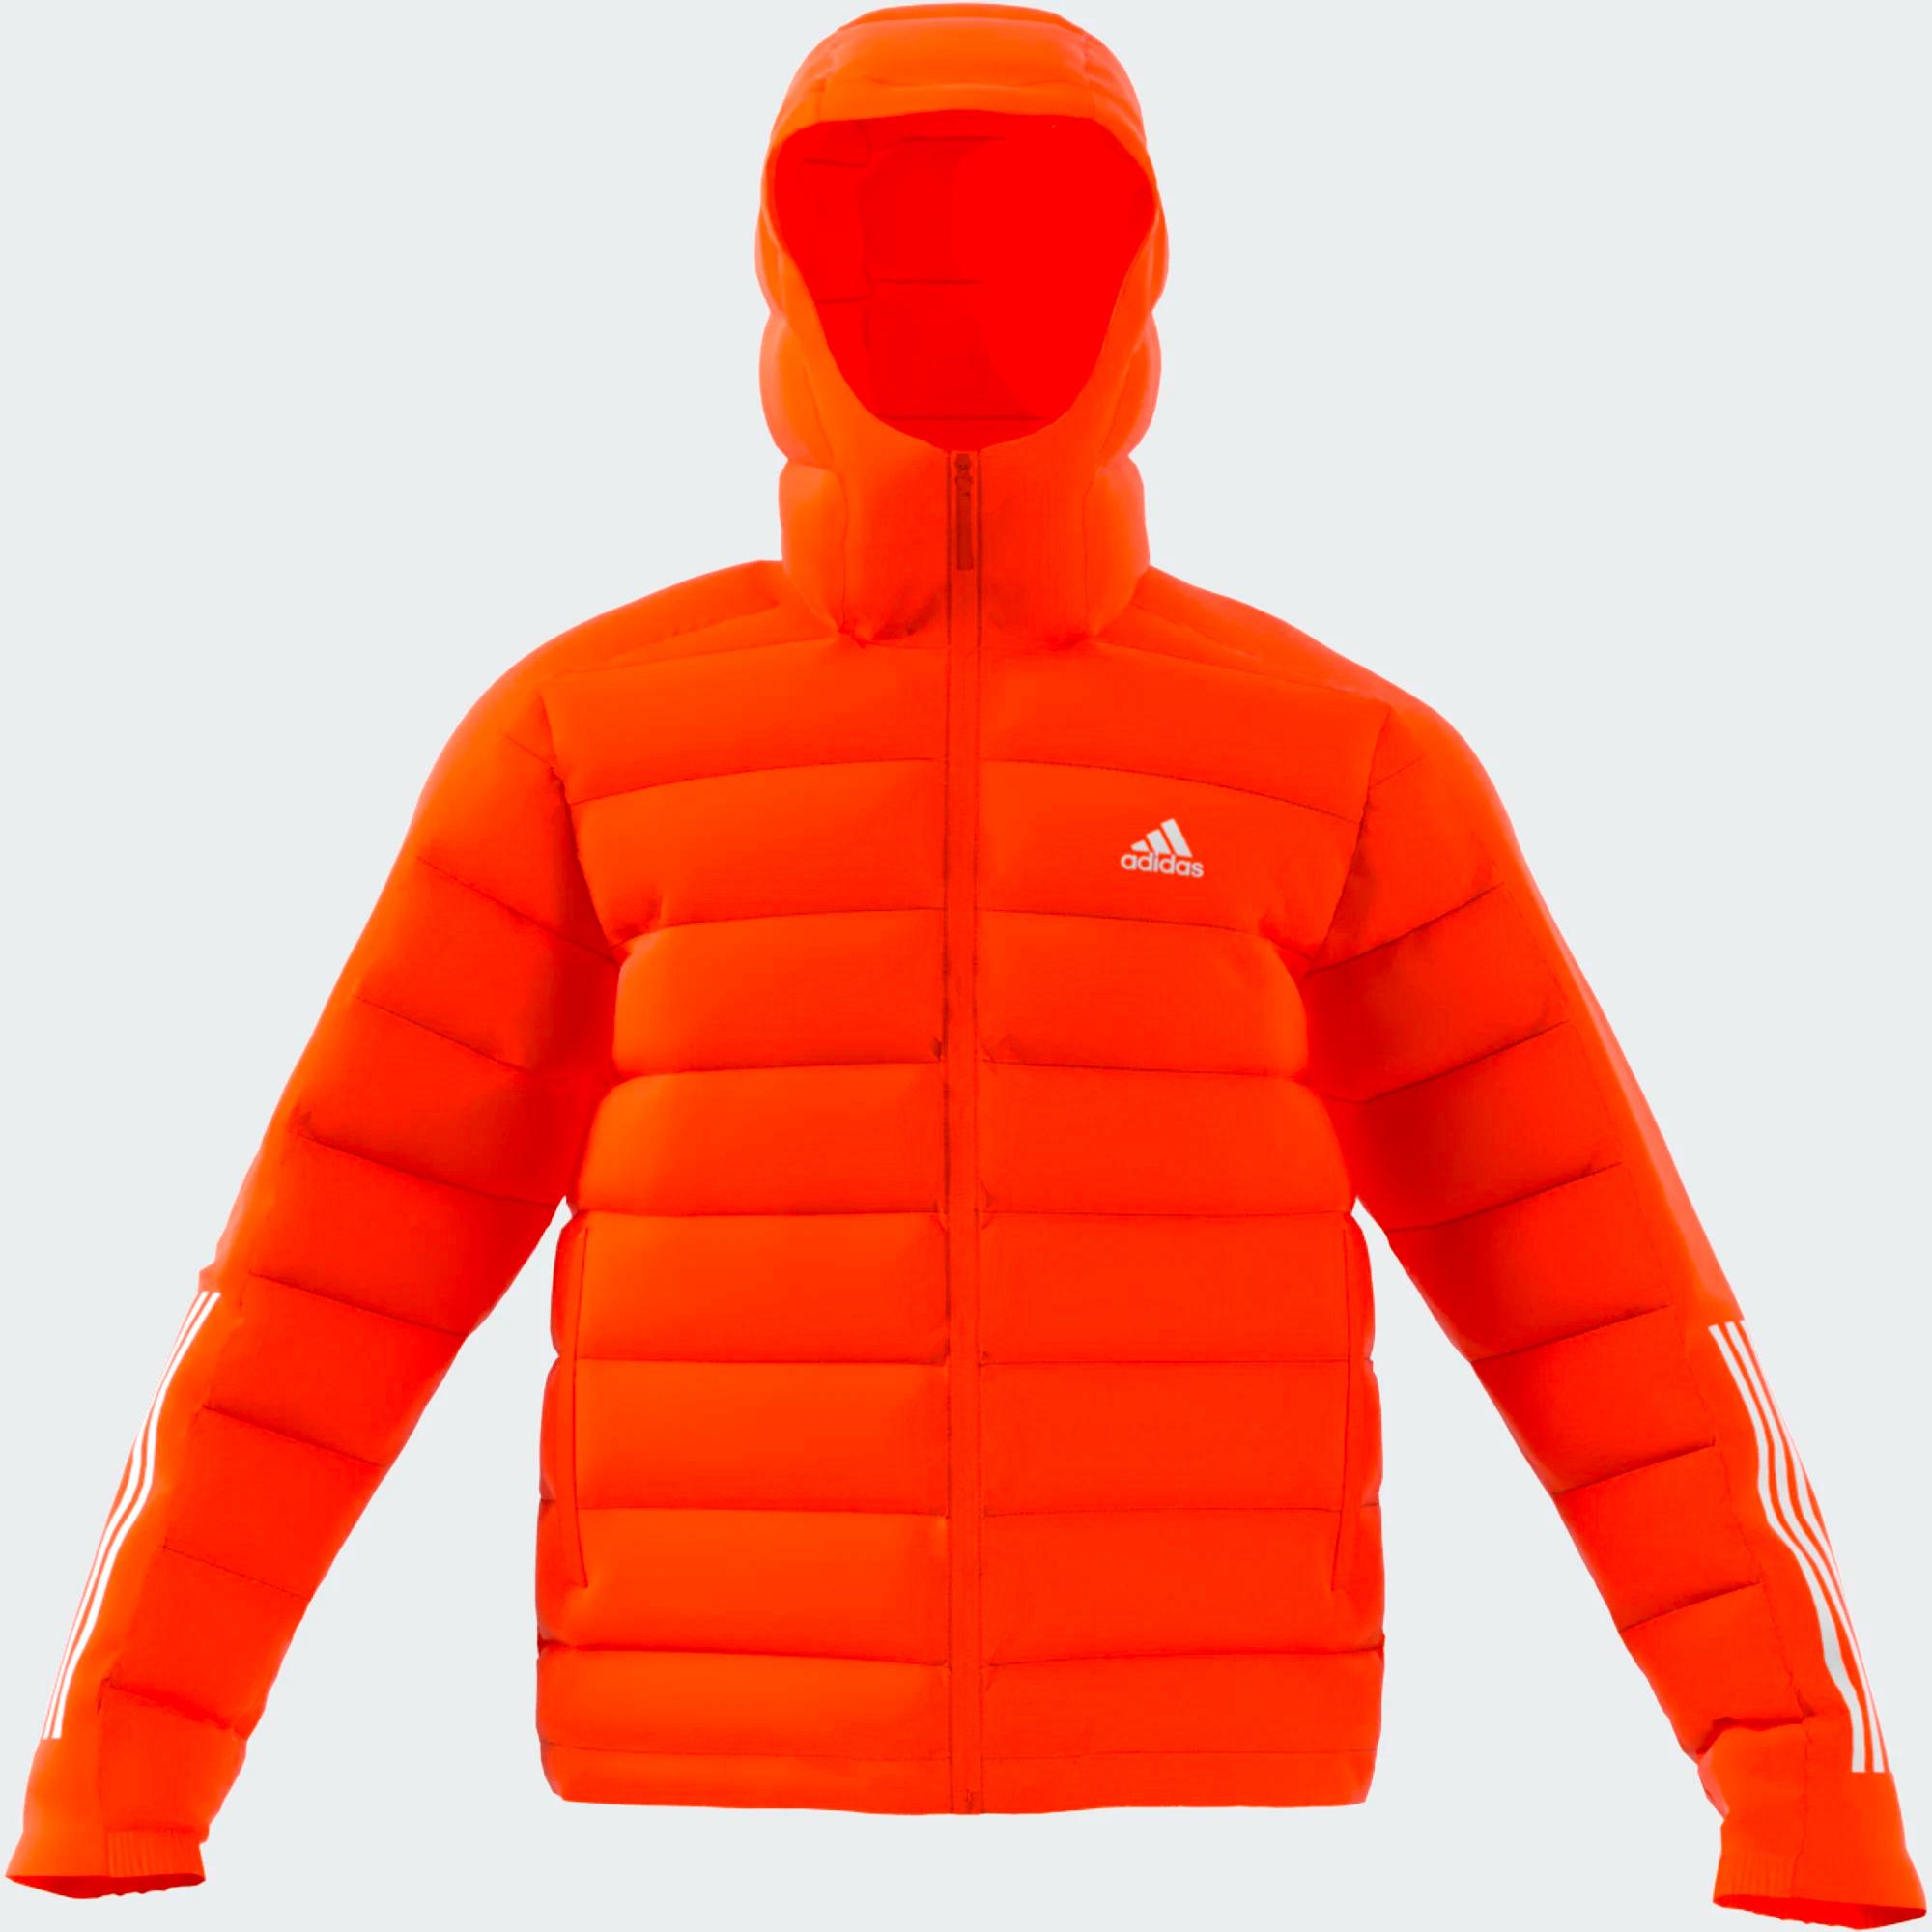 Adidas Itavic 3-Stripes 2.0 Jacke